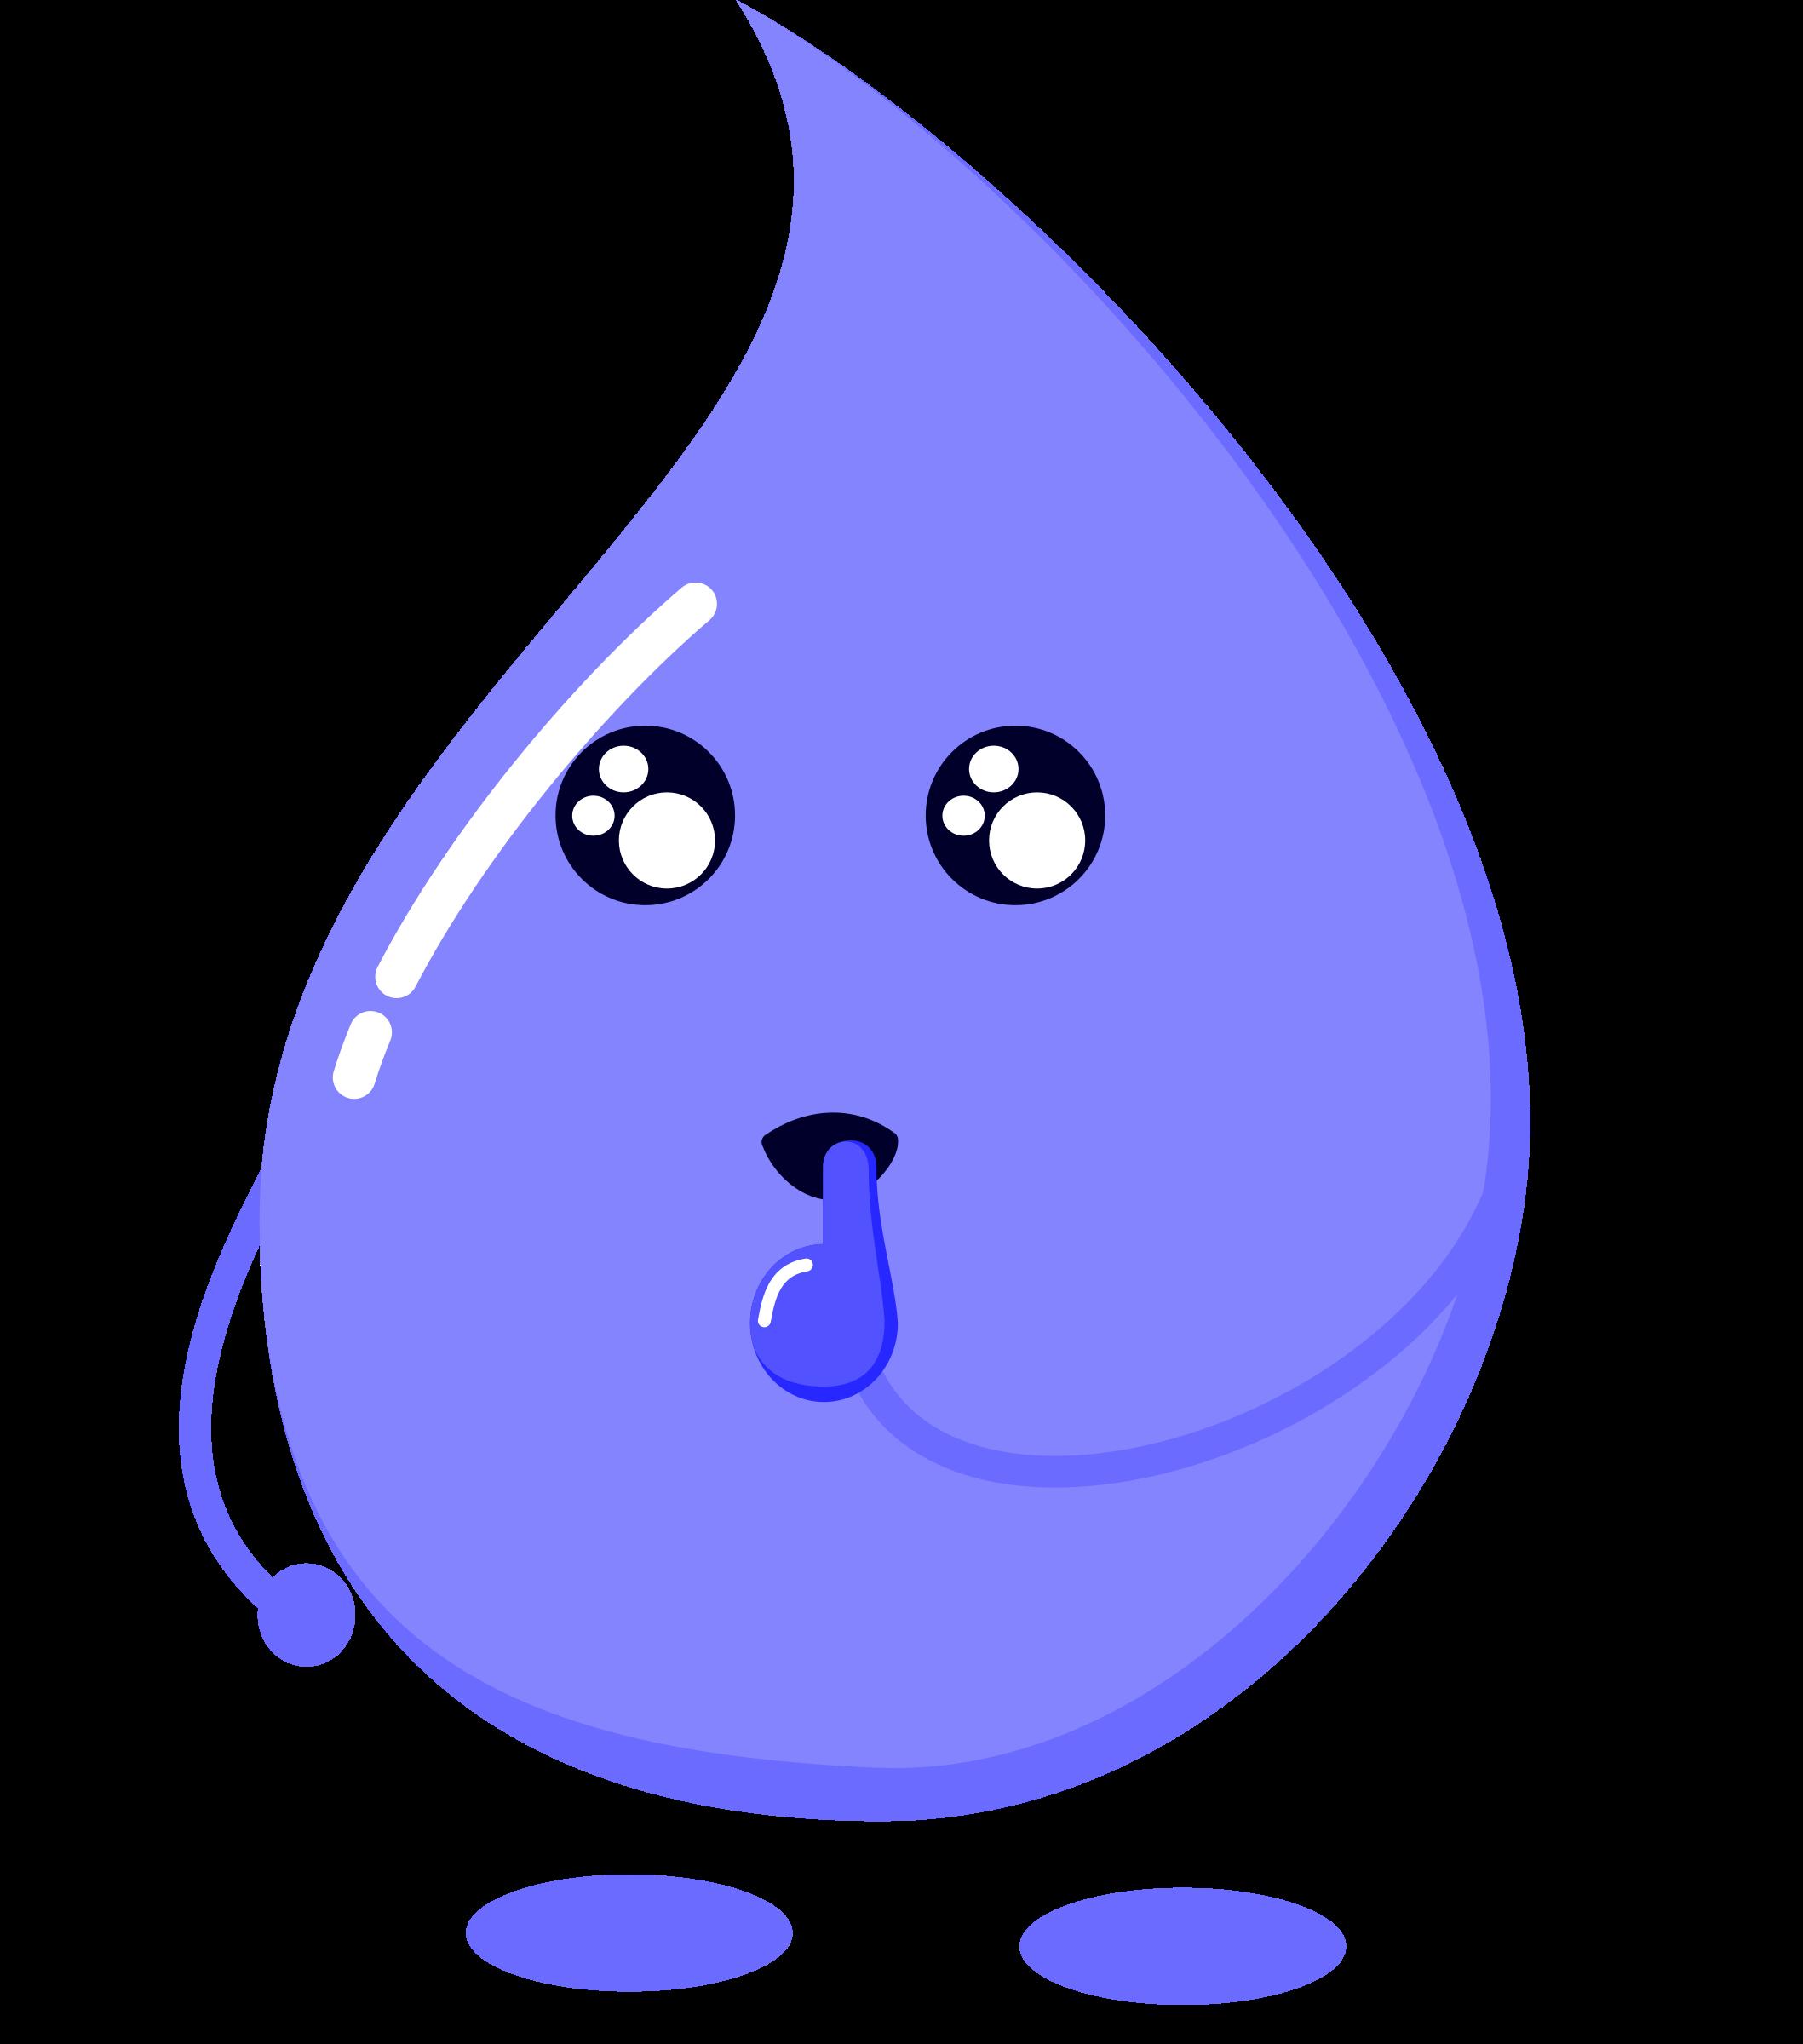 Water clipart water droplet. Drop wonder big image